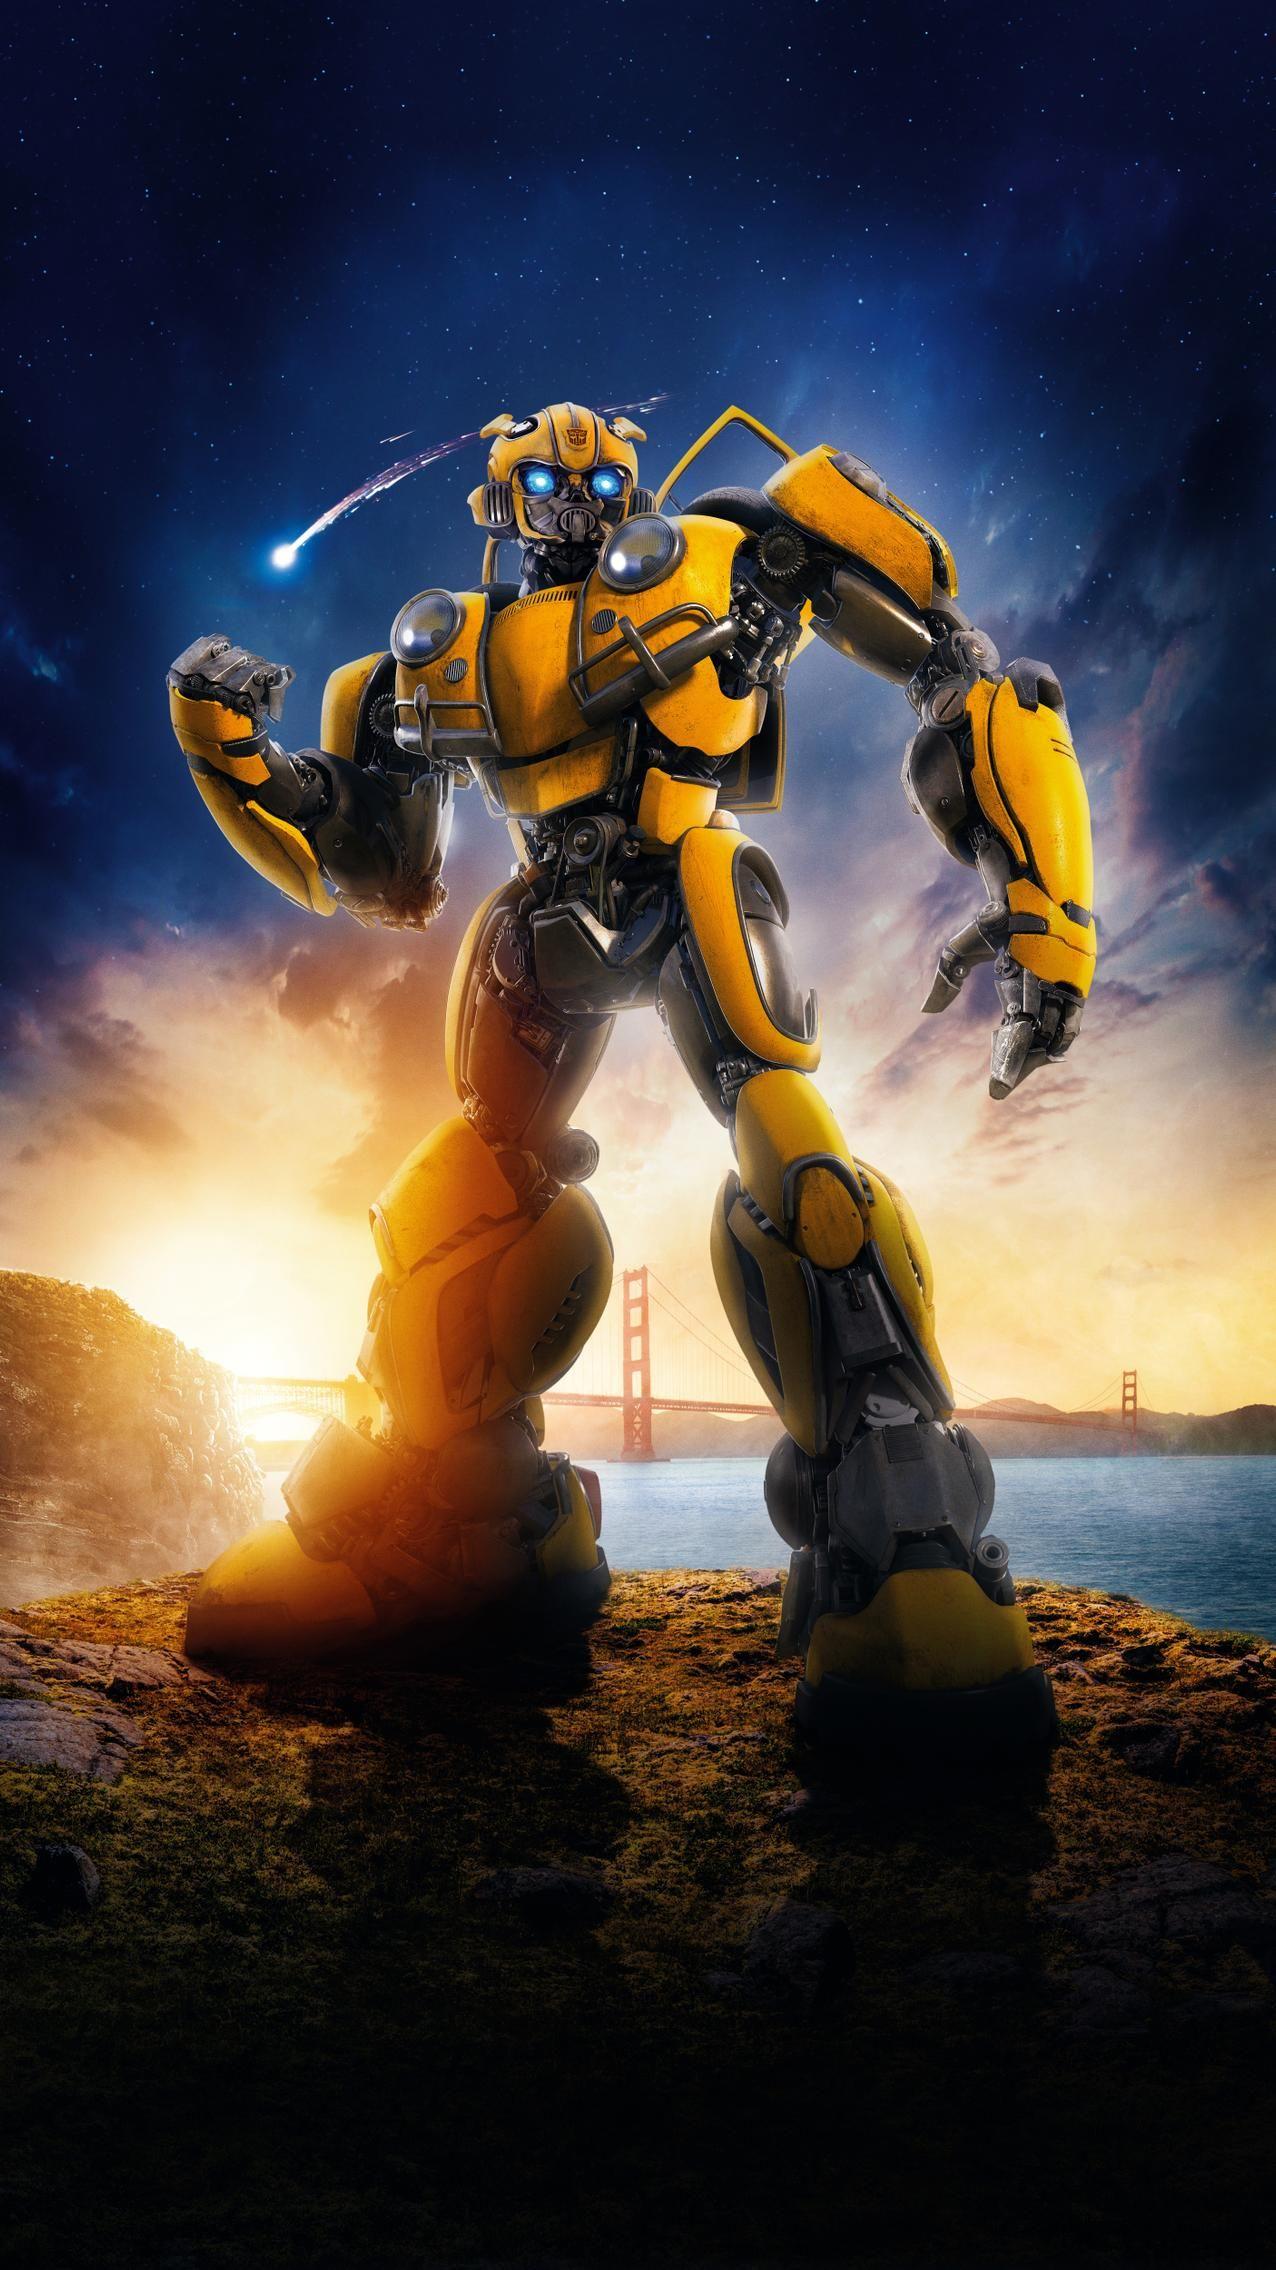 Bumblebee 2018 Phone Wallpaper Moviemania Transformers Bumblebee Transformers Transformers Movie